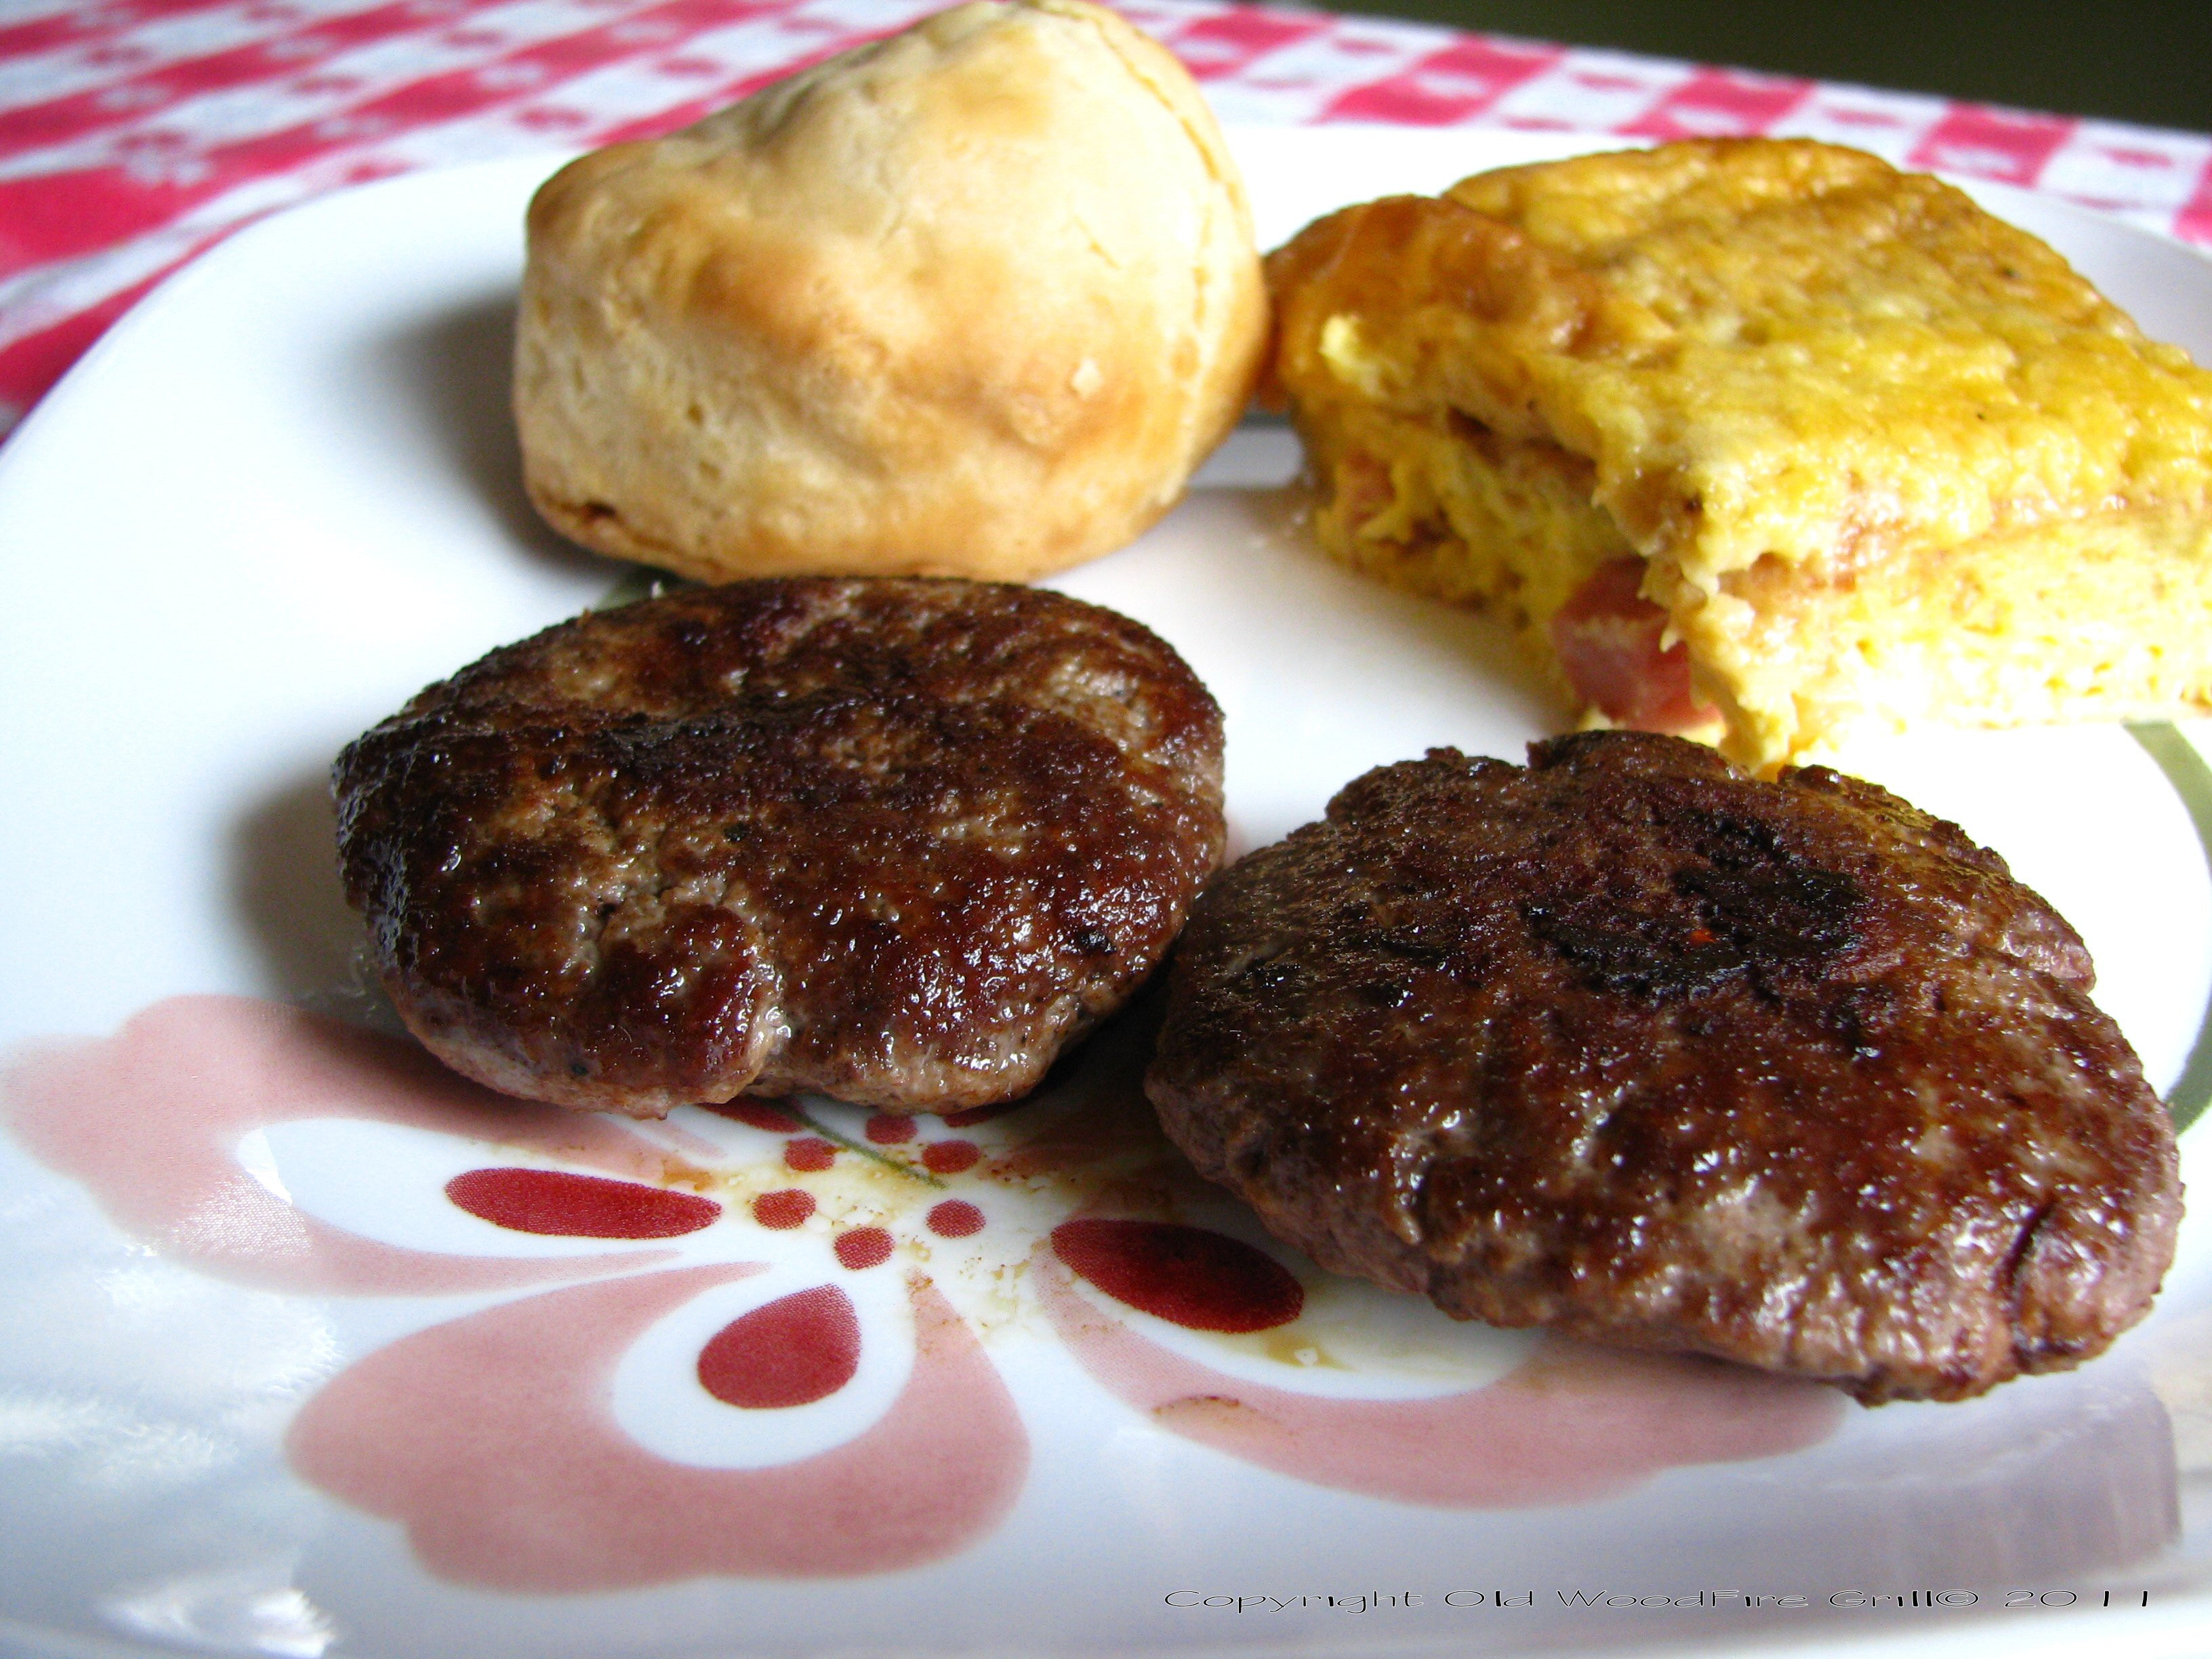 Venison Breakfast Sausage Recipes  Venison Breakfast Sausage